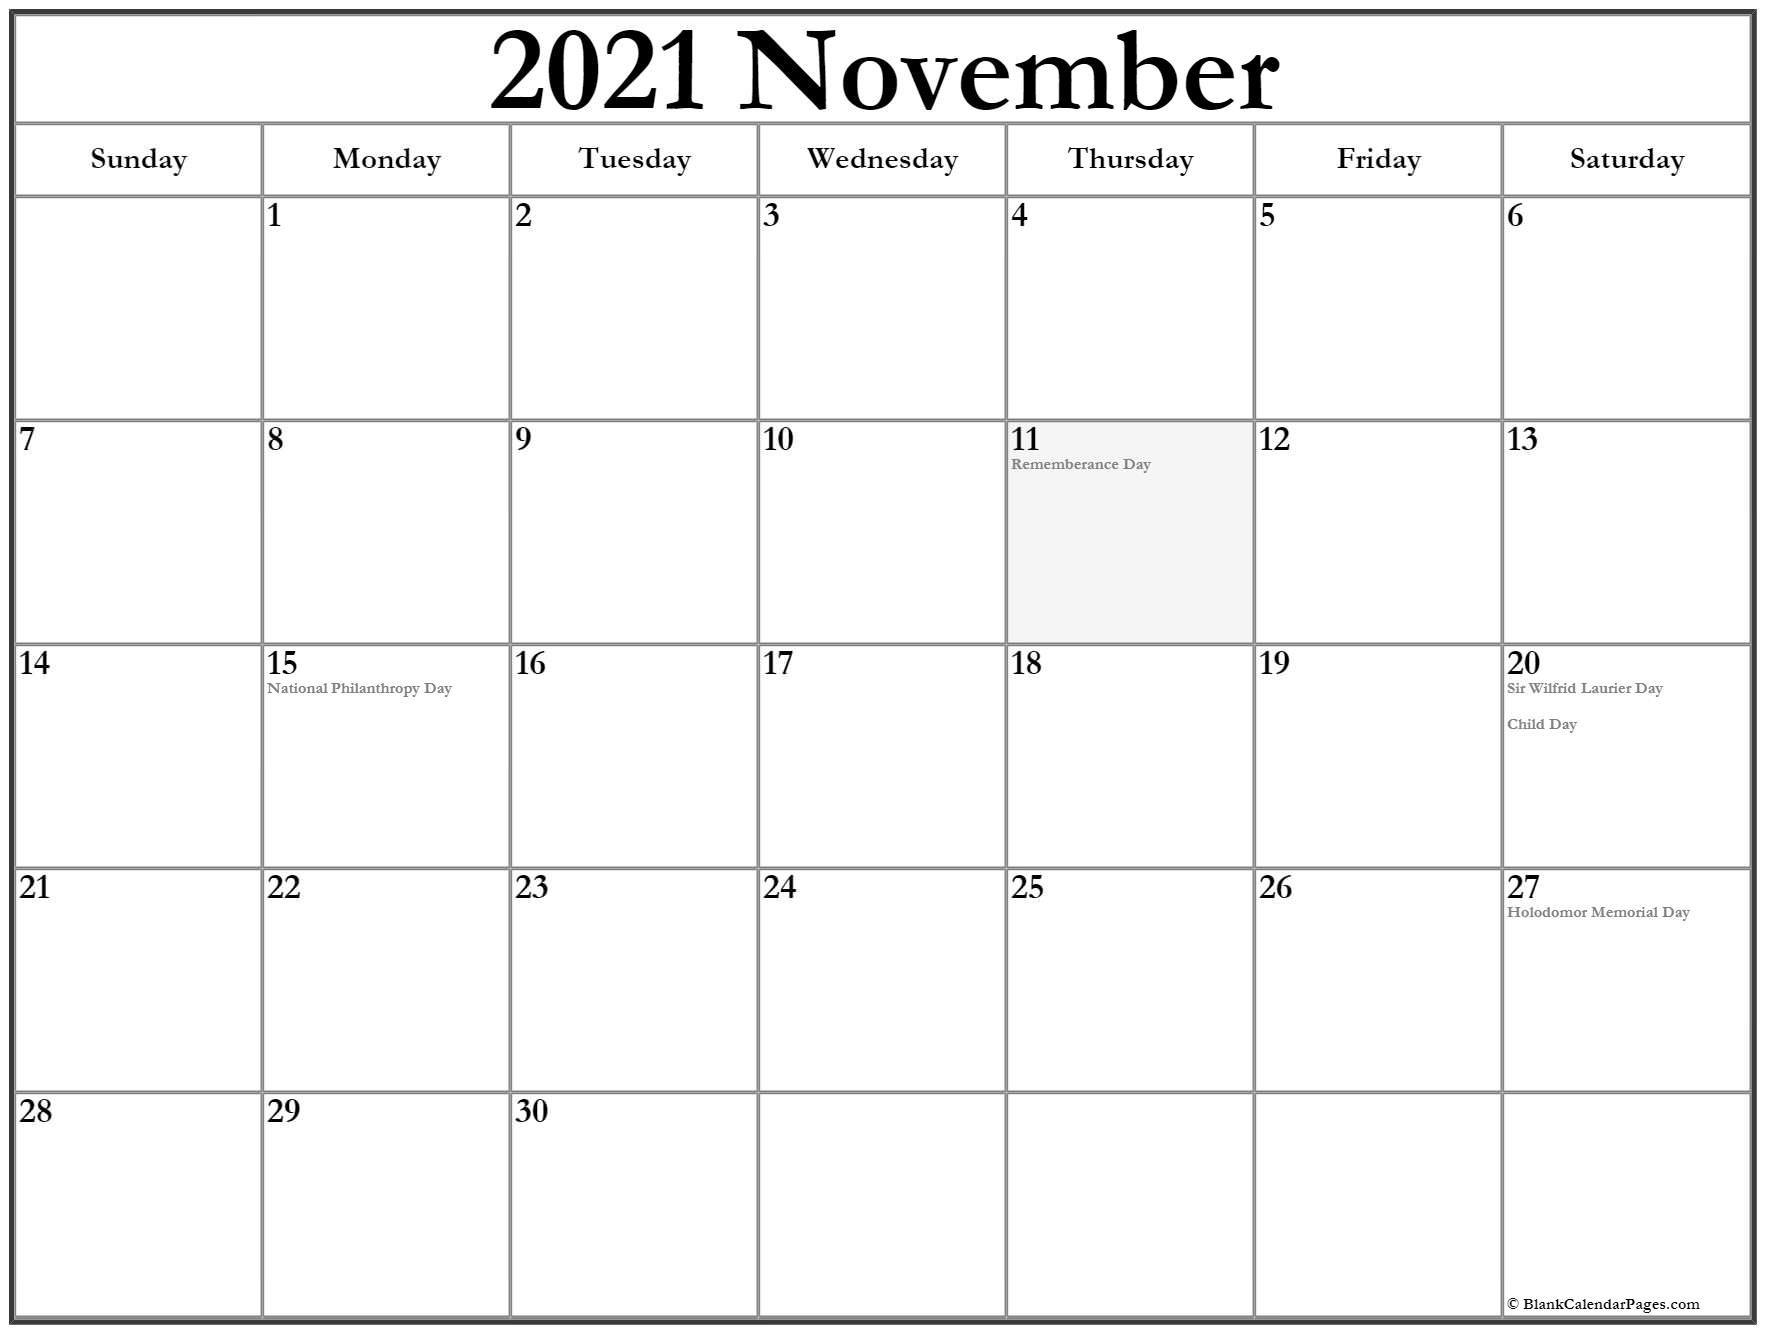 January 2021 Calendar Canada   Printable Calendar Design July 2021 Calendar Canada Printable